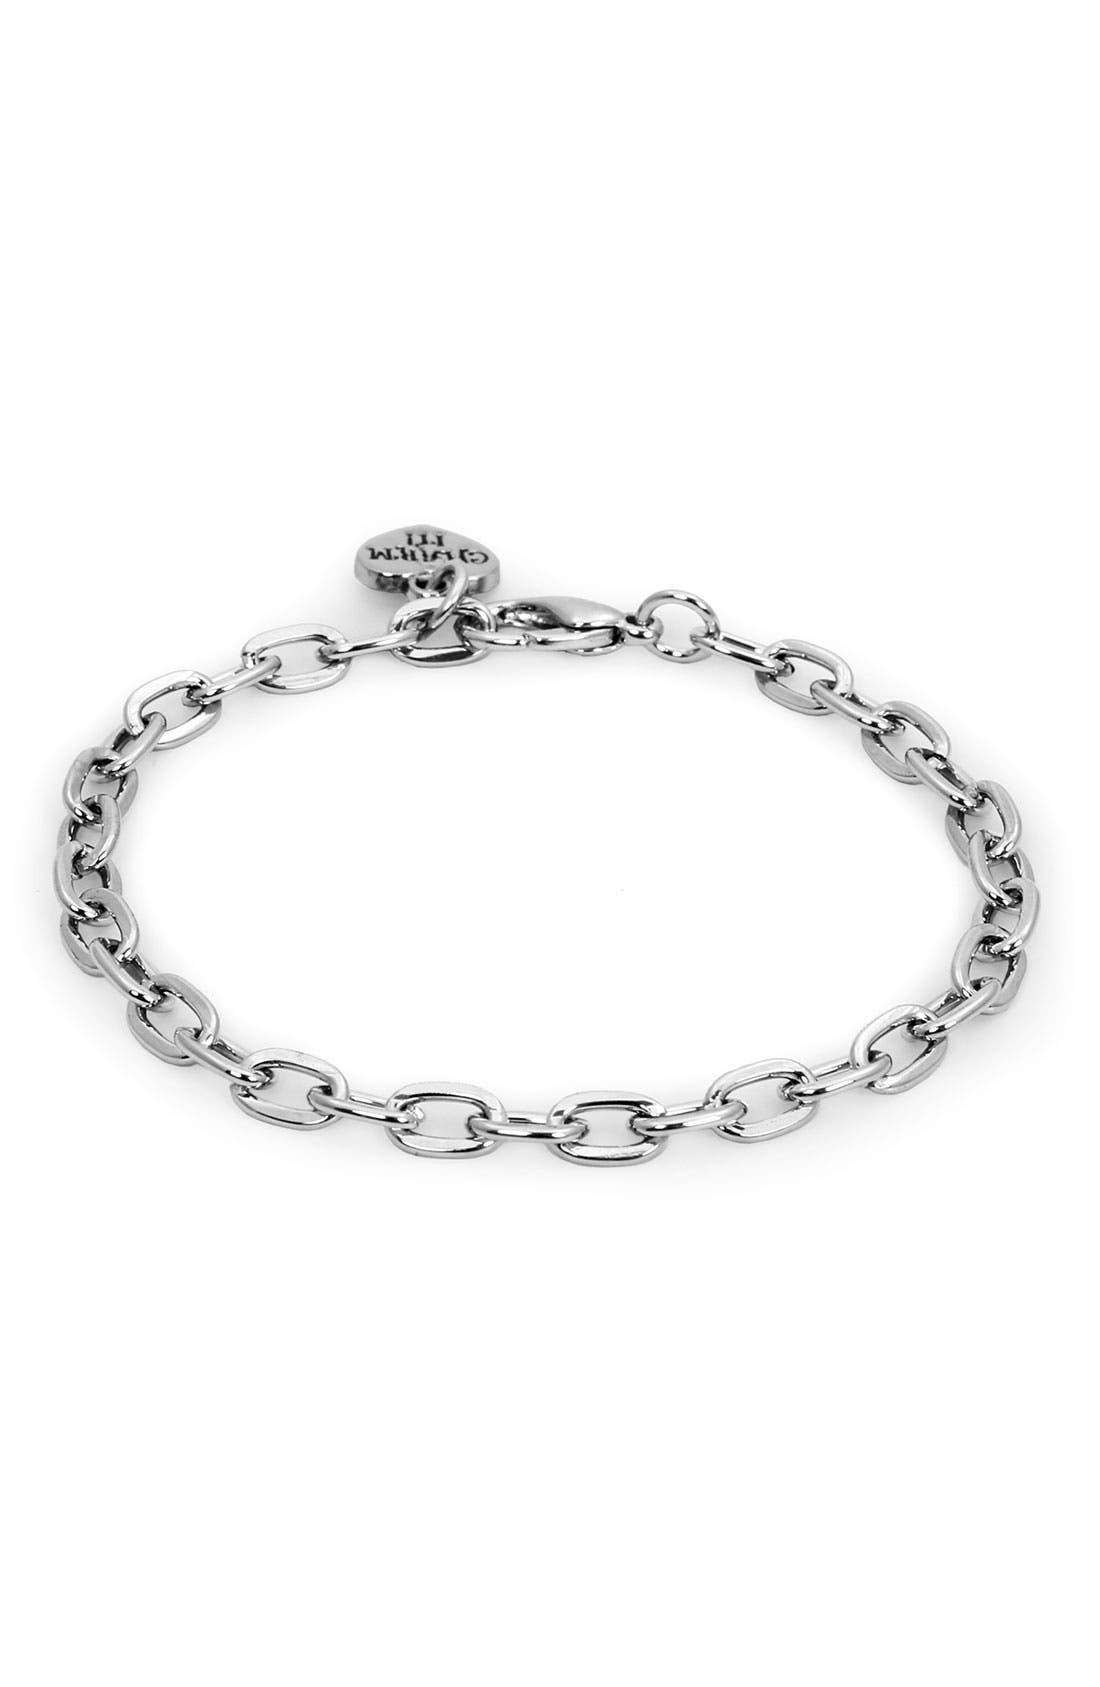 Main Image - CHARM IT!® Charm Bracelet (Girls)